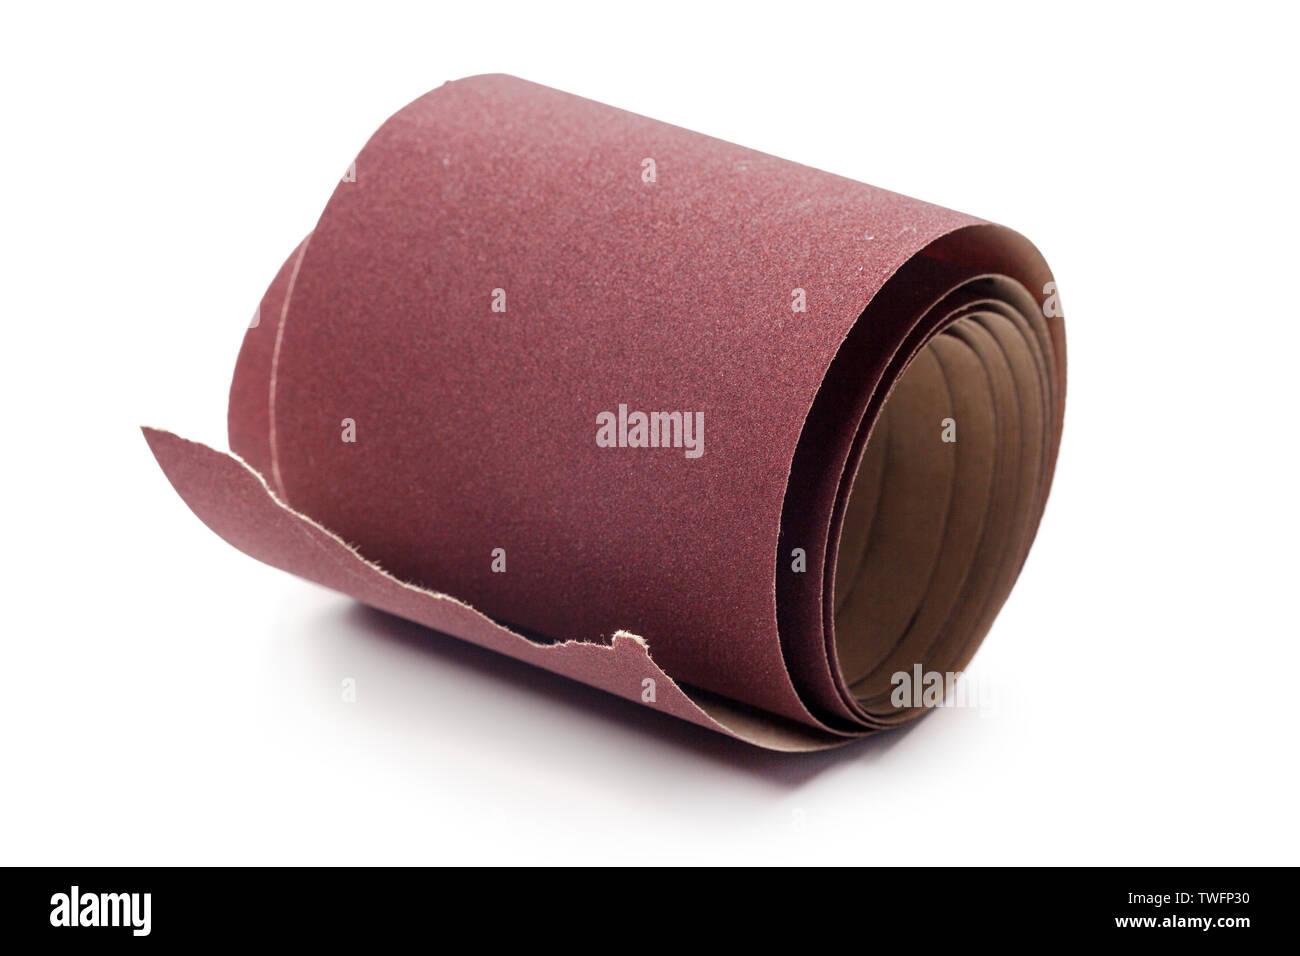 Emery paper - sandpaper - Stock Image